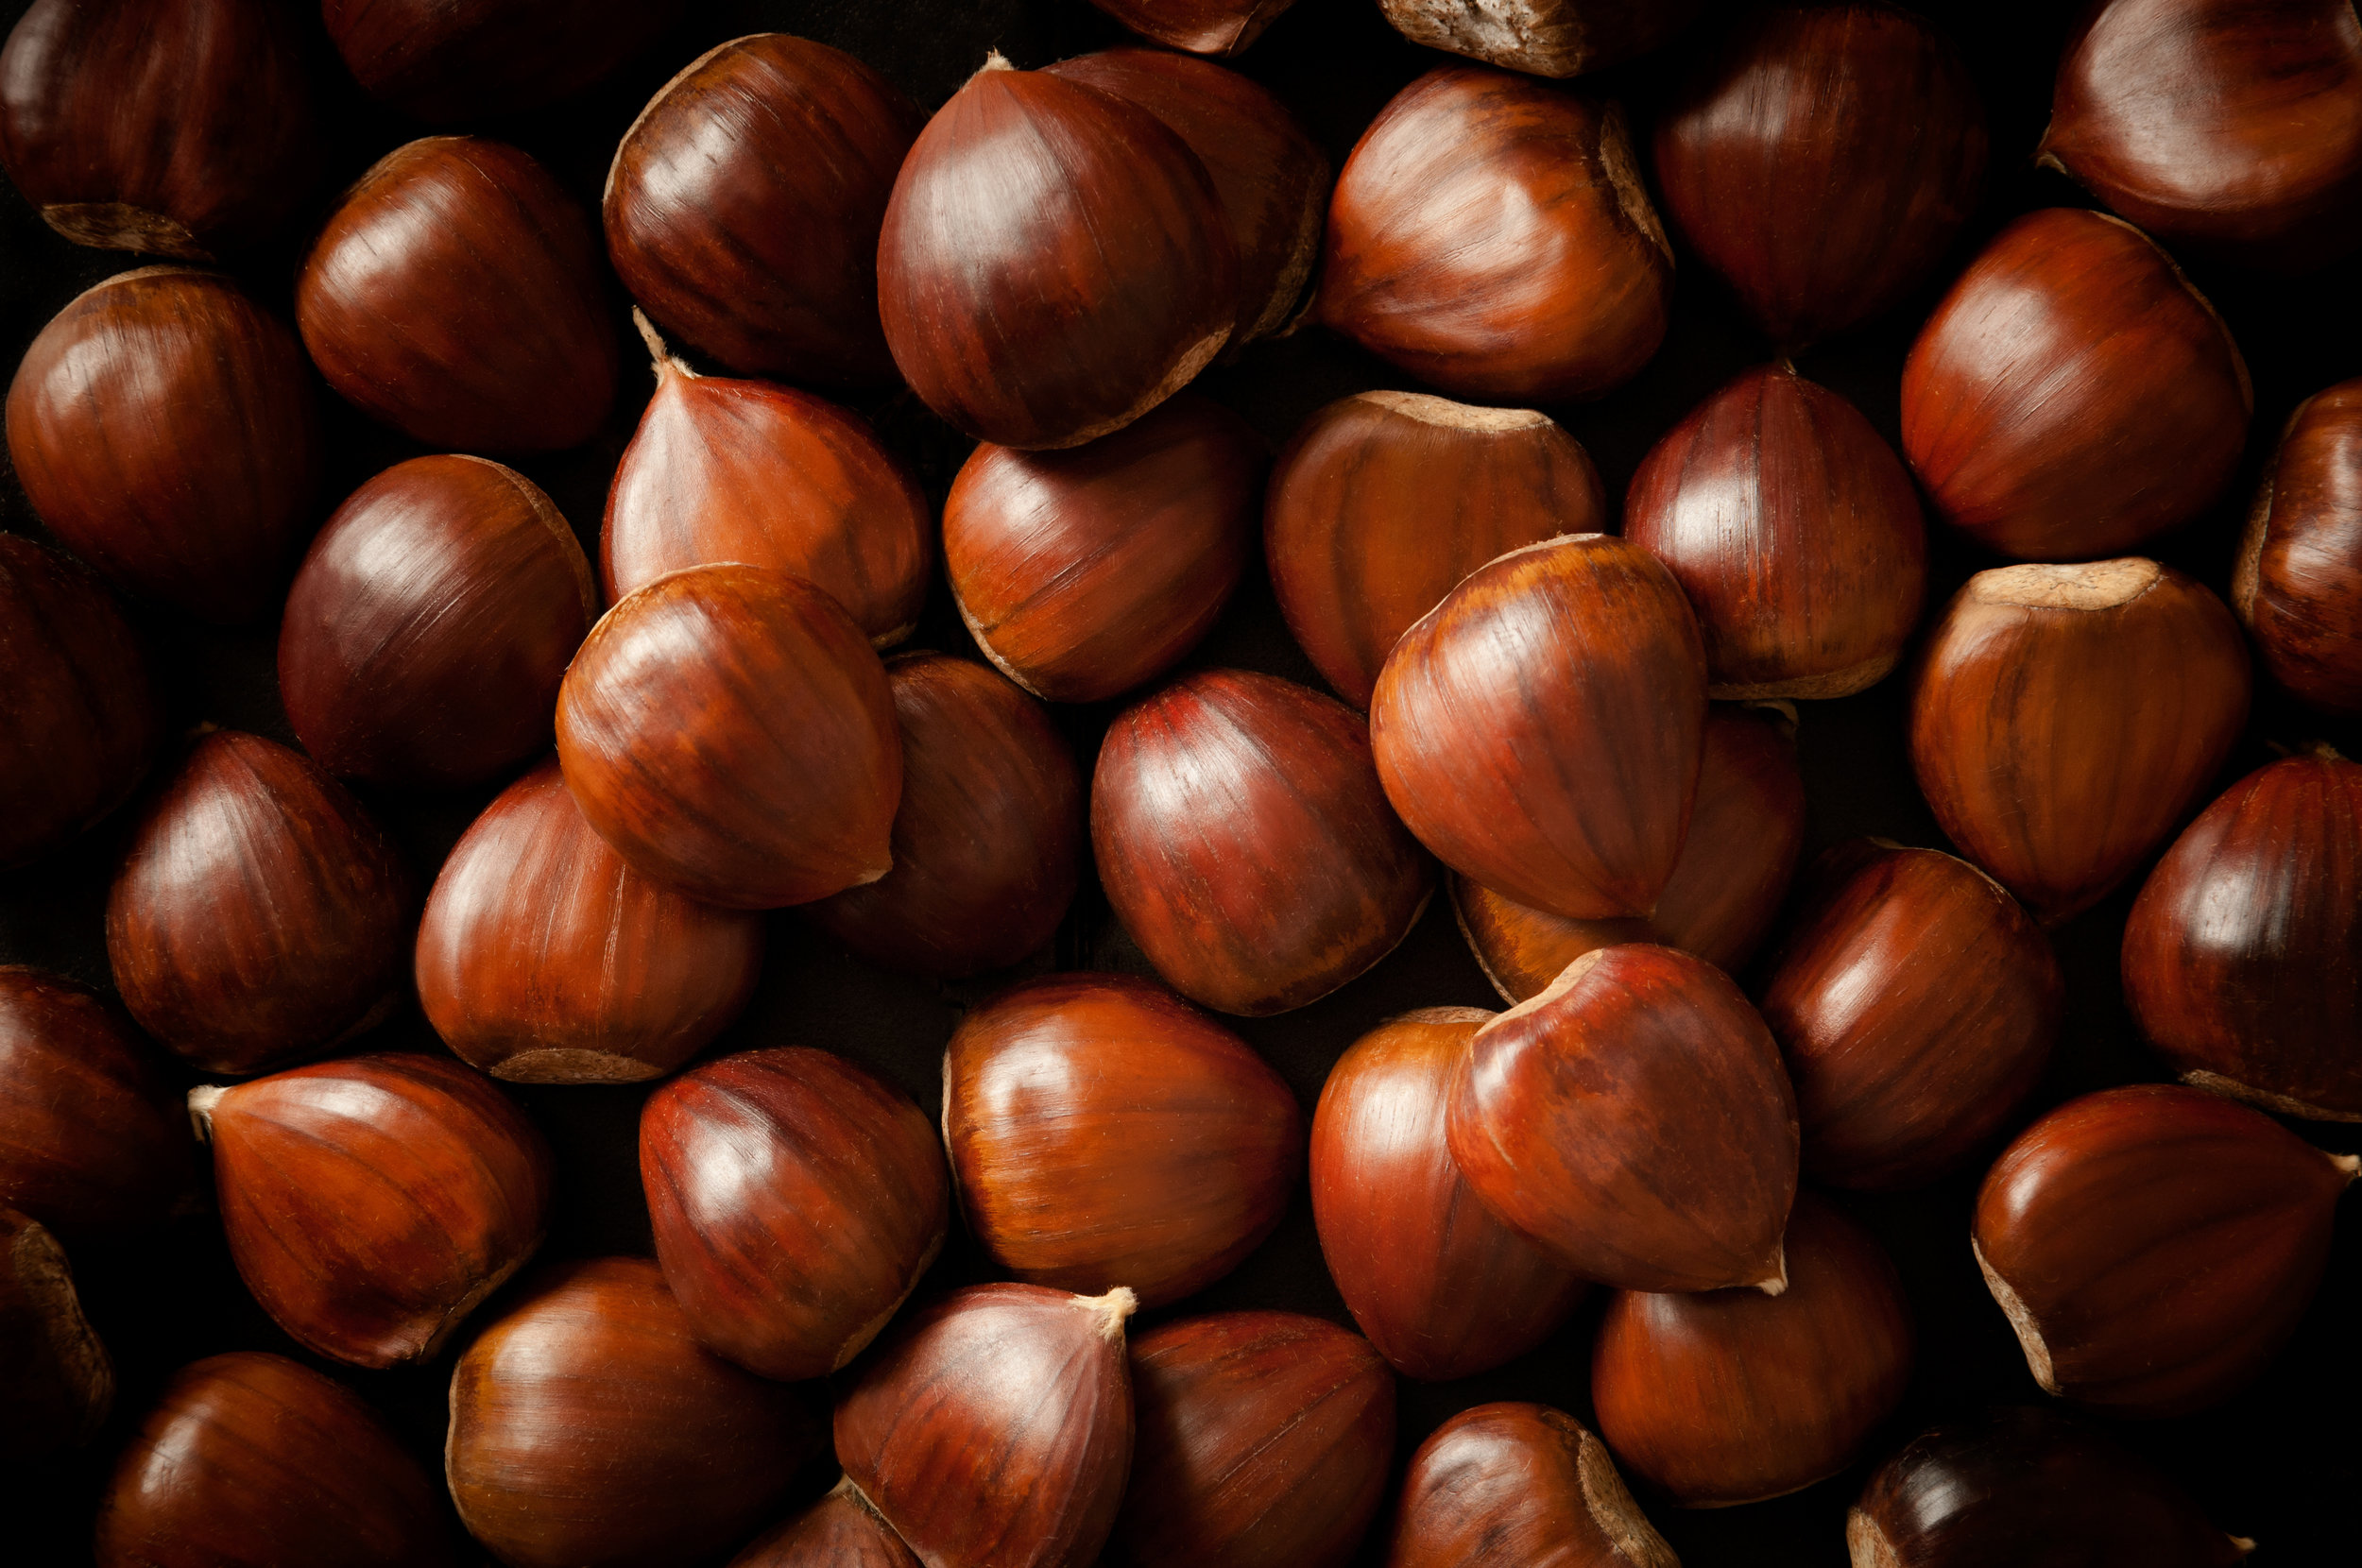 nuts_chestnuts (closeup)_242568343.jpg